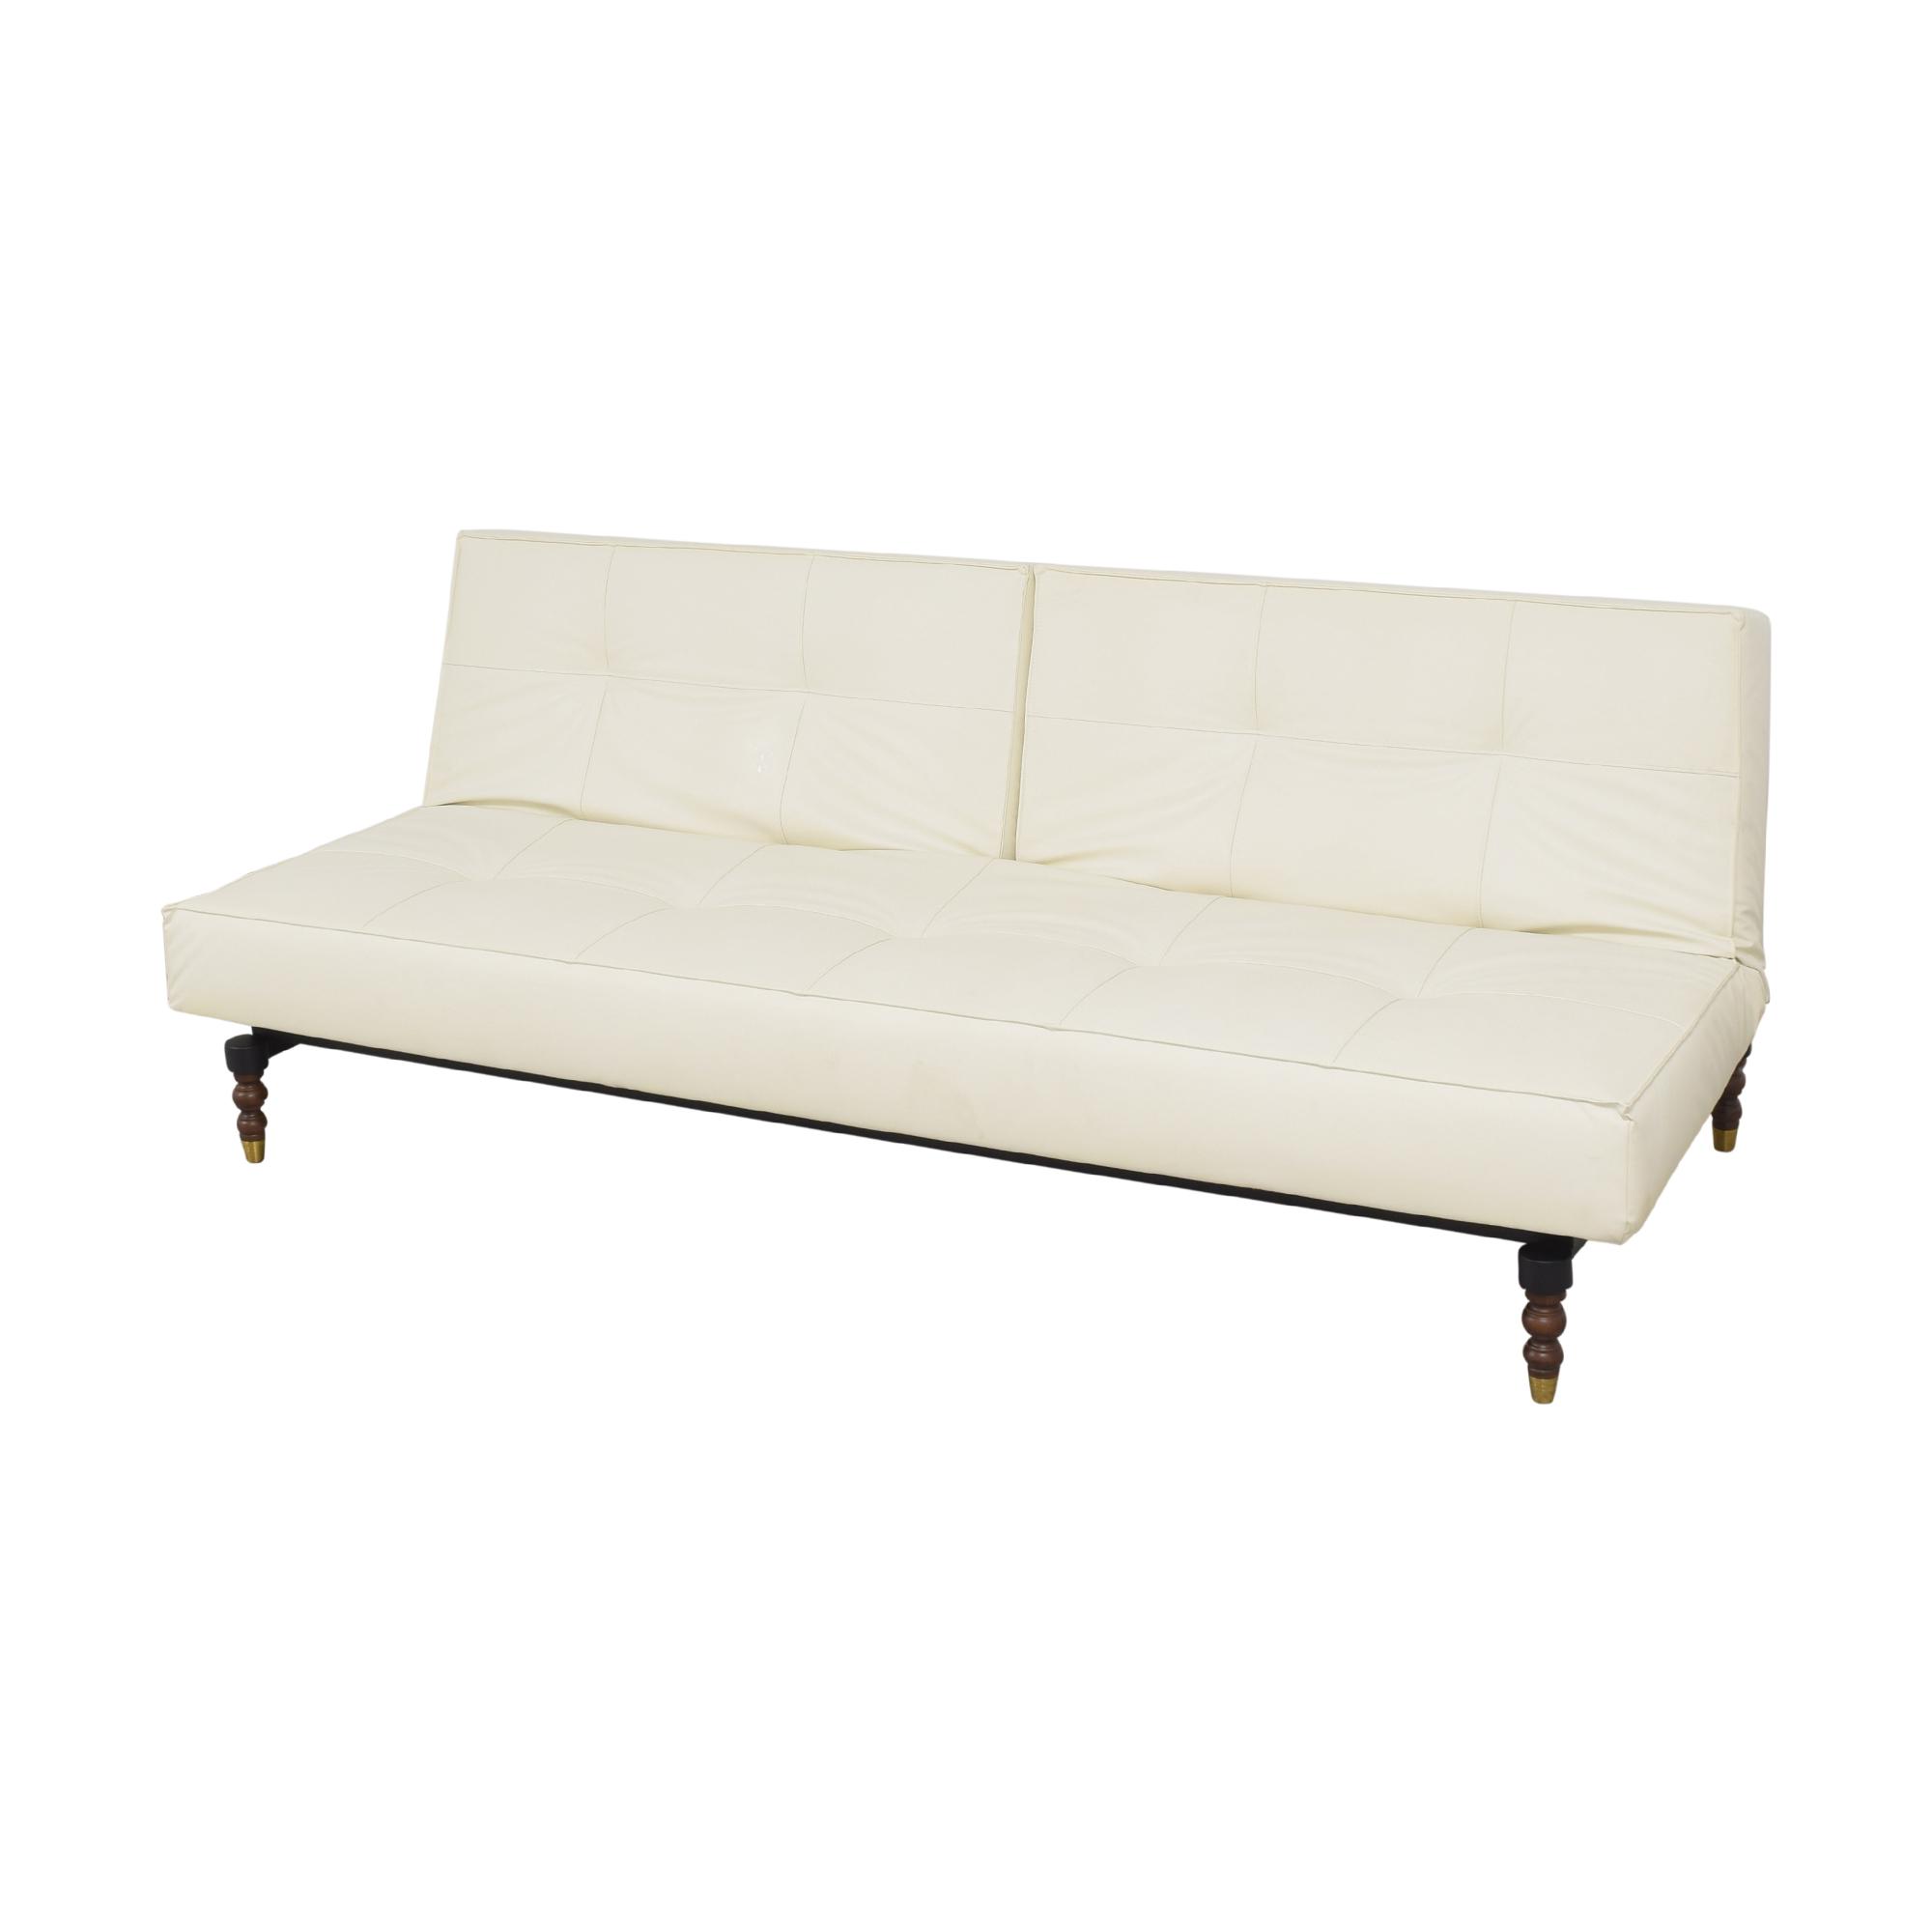 Innovation Living Innovation Living Splitback Convertible Sleeper Sofa